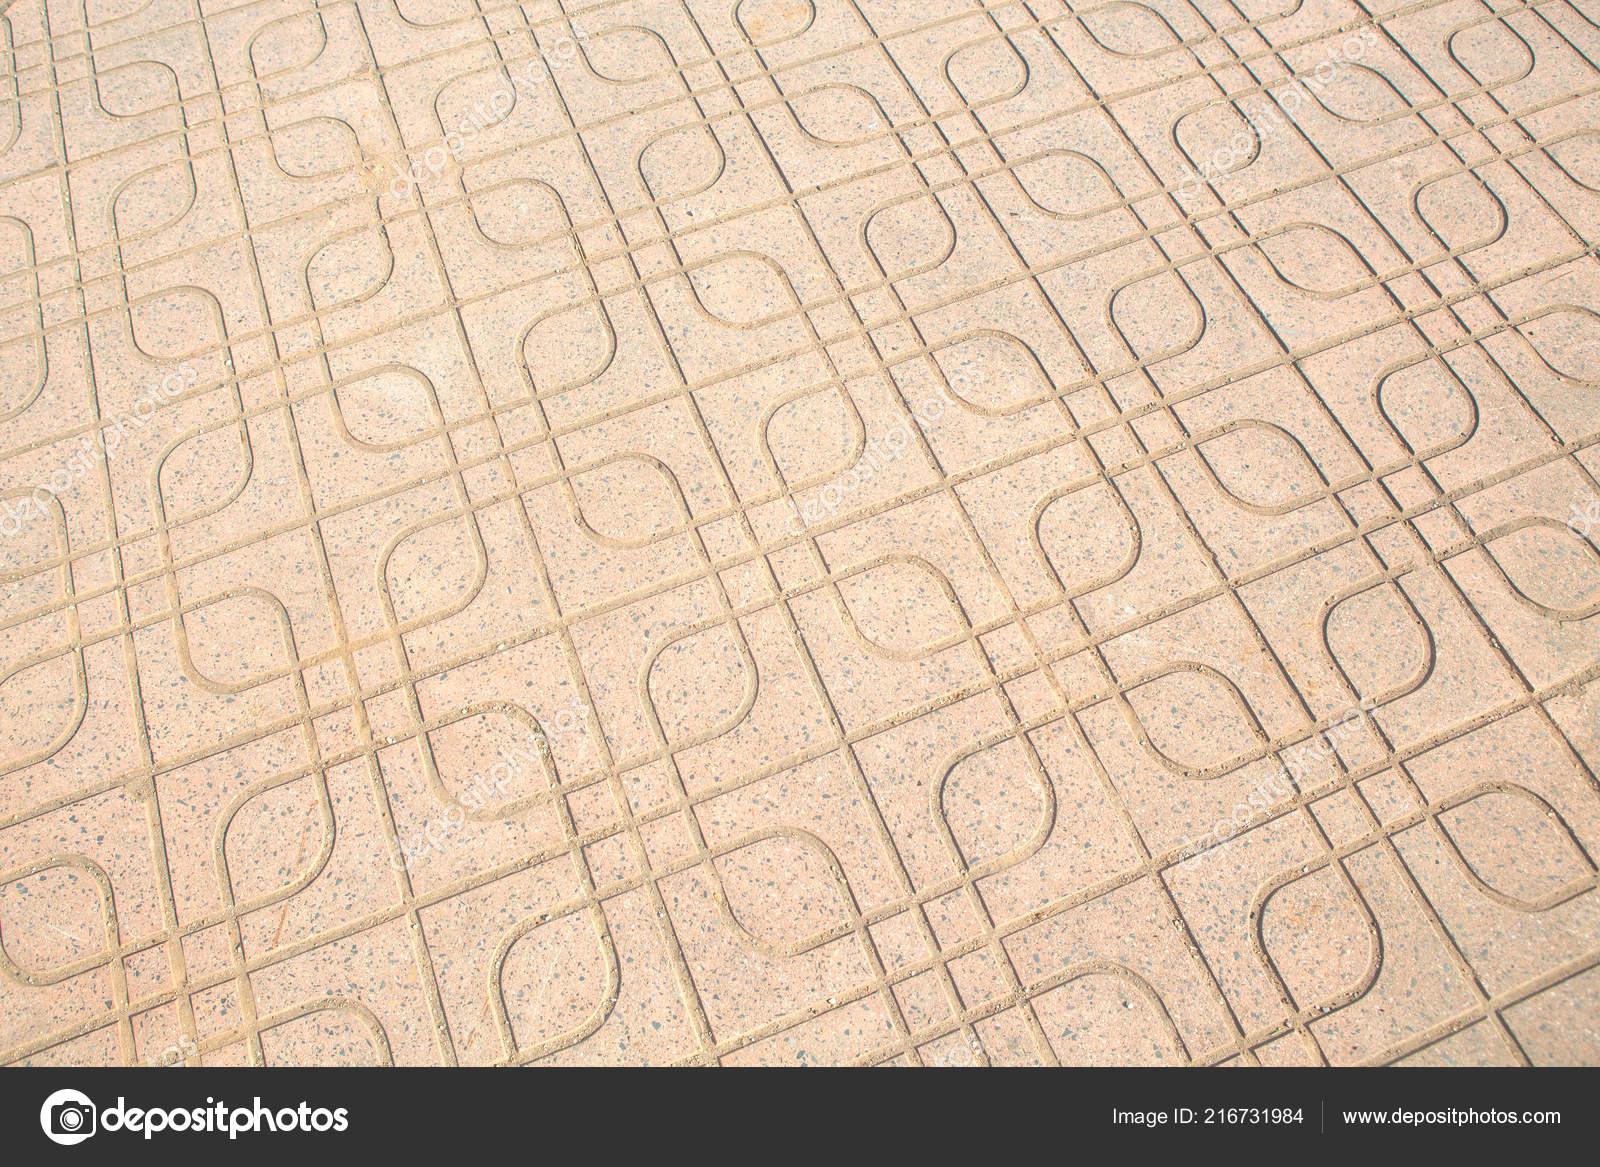 Sidewalk texture seamless Urban Sidewalk Stone Floor Tile Seamless Background Texture Stock Photo Depositphotos Sidewalk Stone Floor Tile Seamless Background Texture Stock Photo